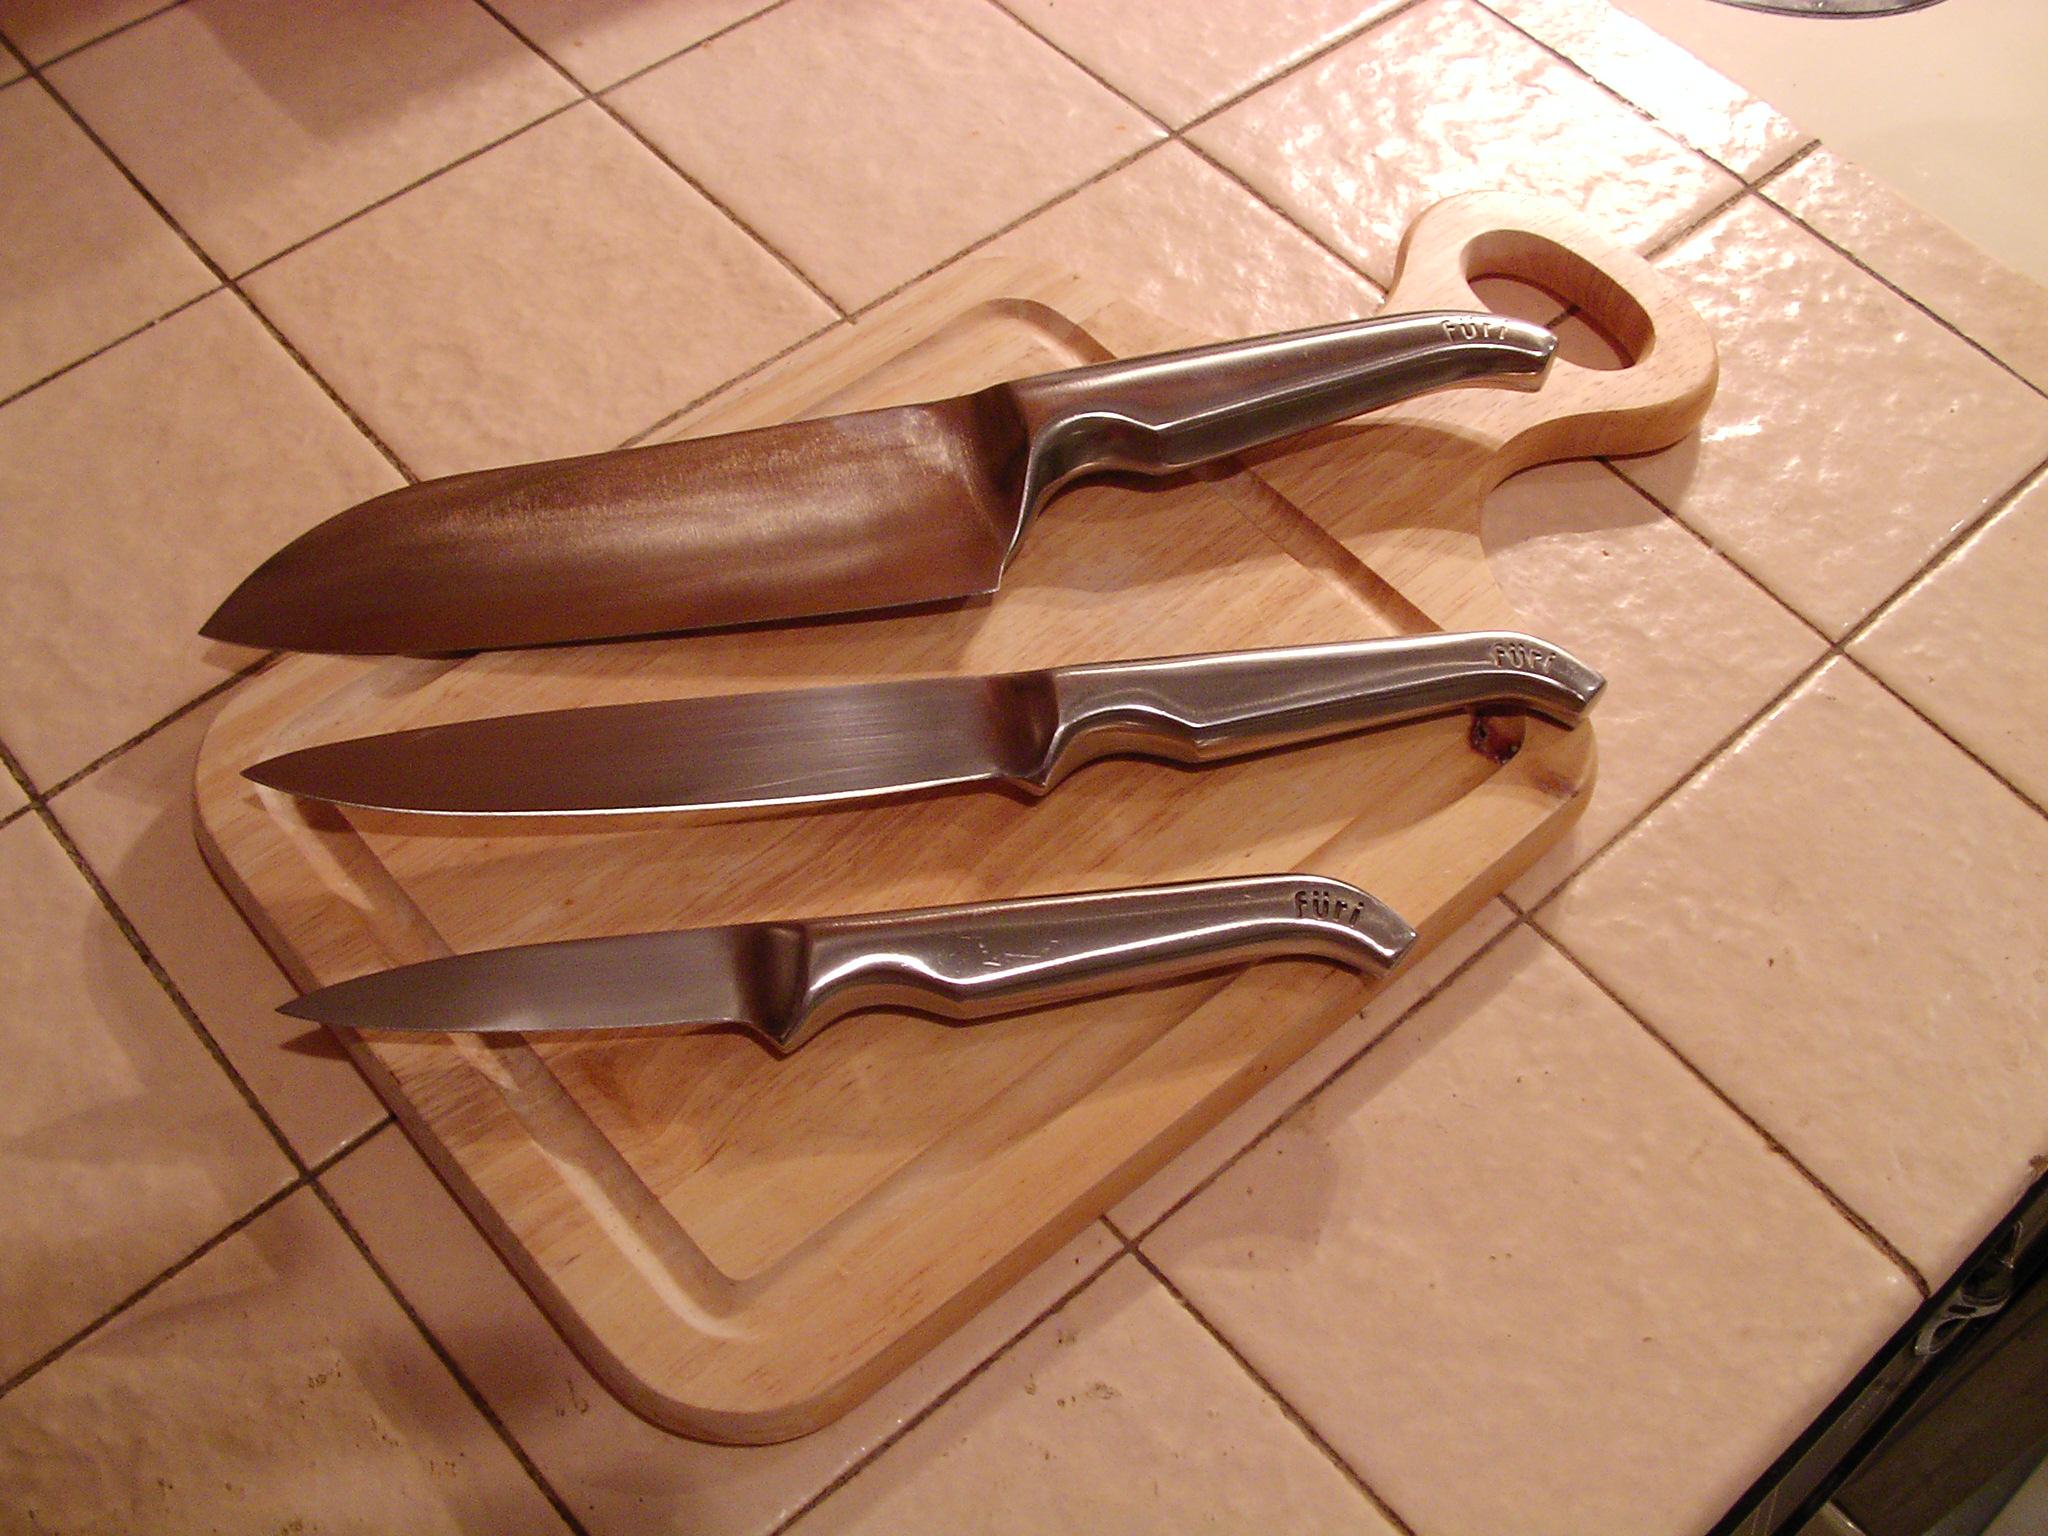 Furi Knives